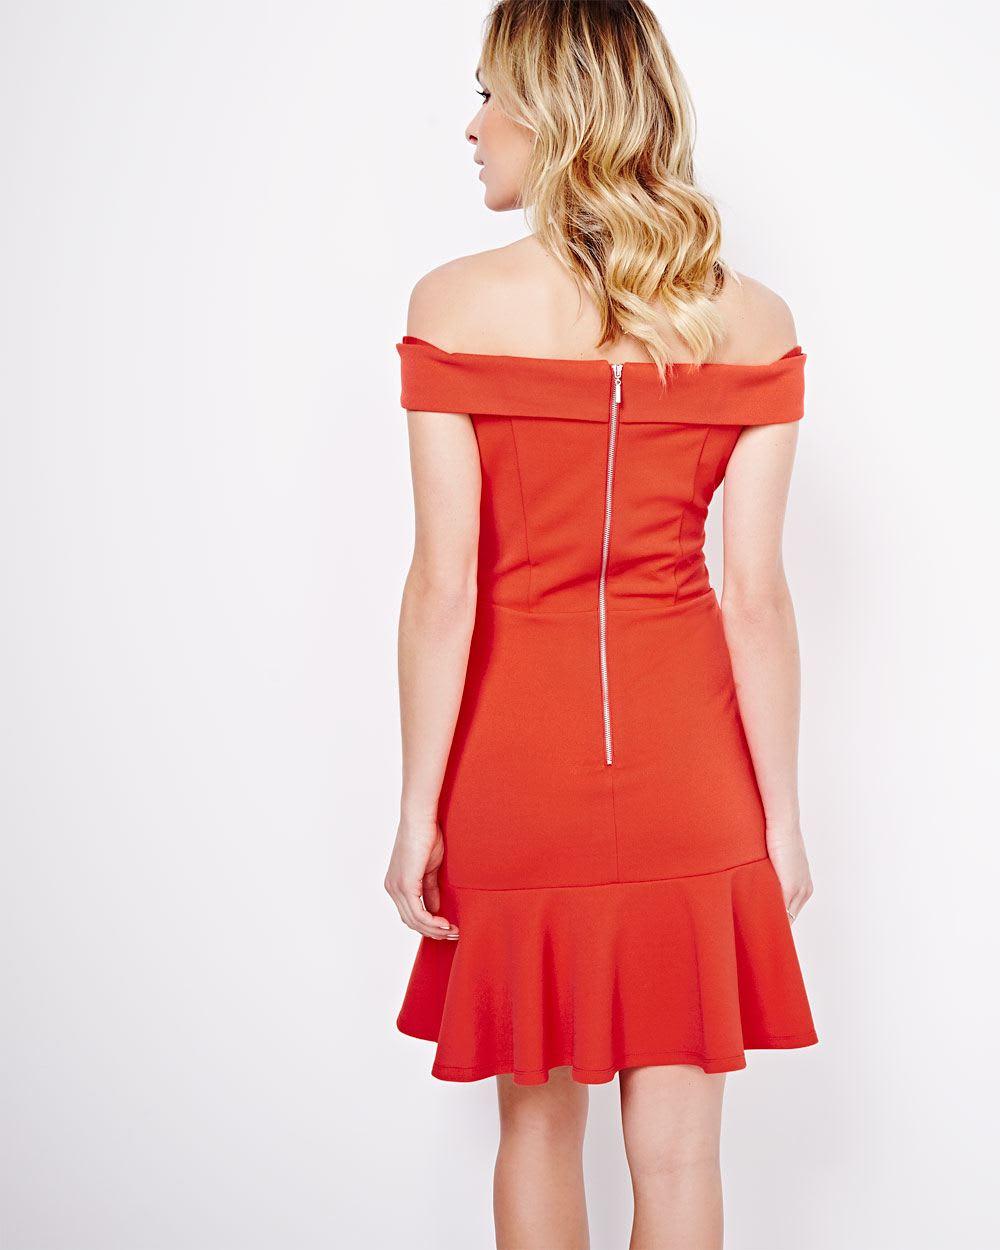 ABS by Allen Schwartz Off-Shoulder Dress with Peplum Hem | RW&CO.